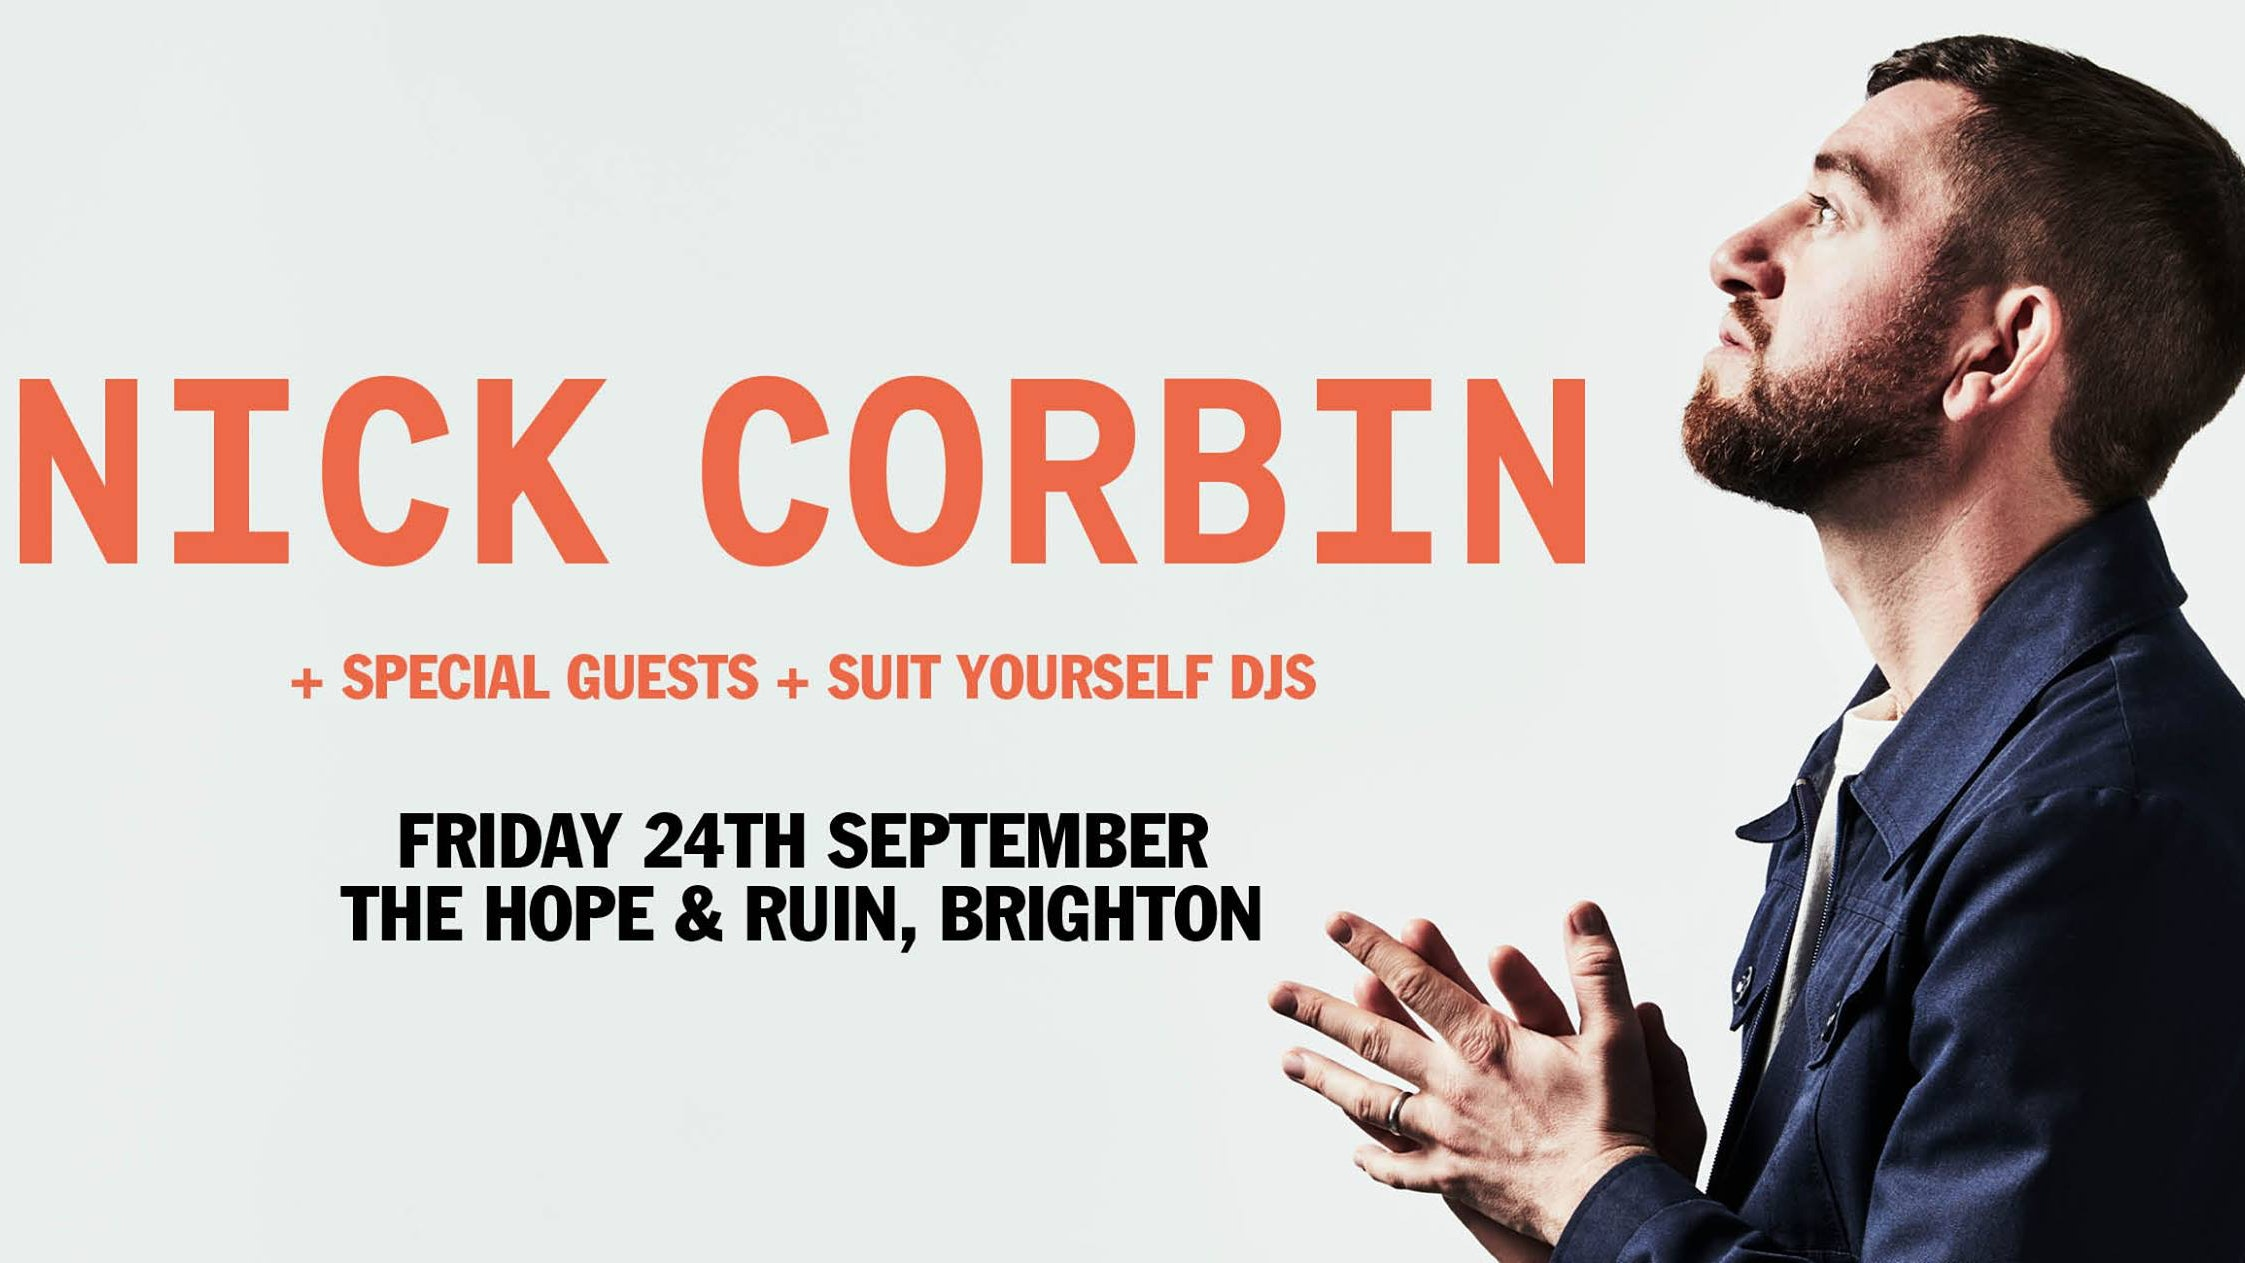 Nick Corbin (Full Band) + DJs